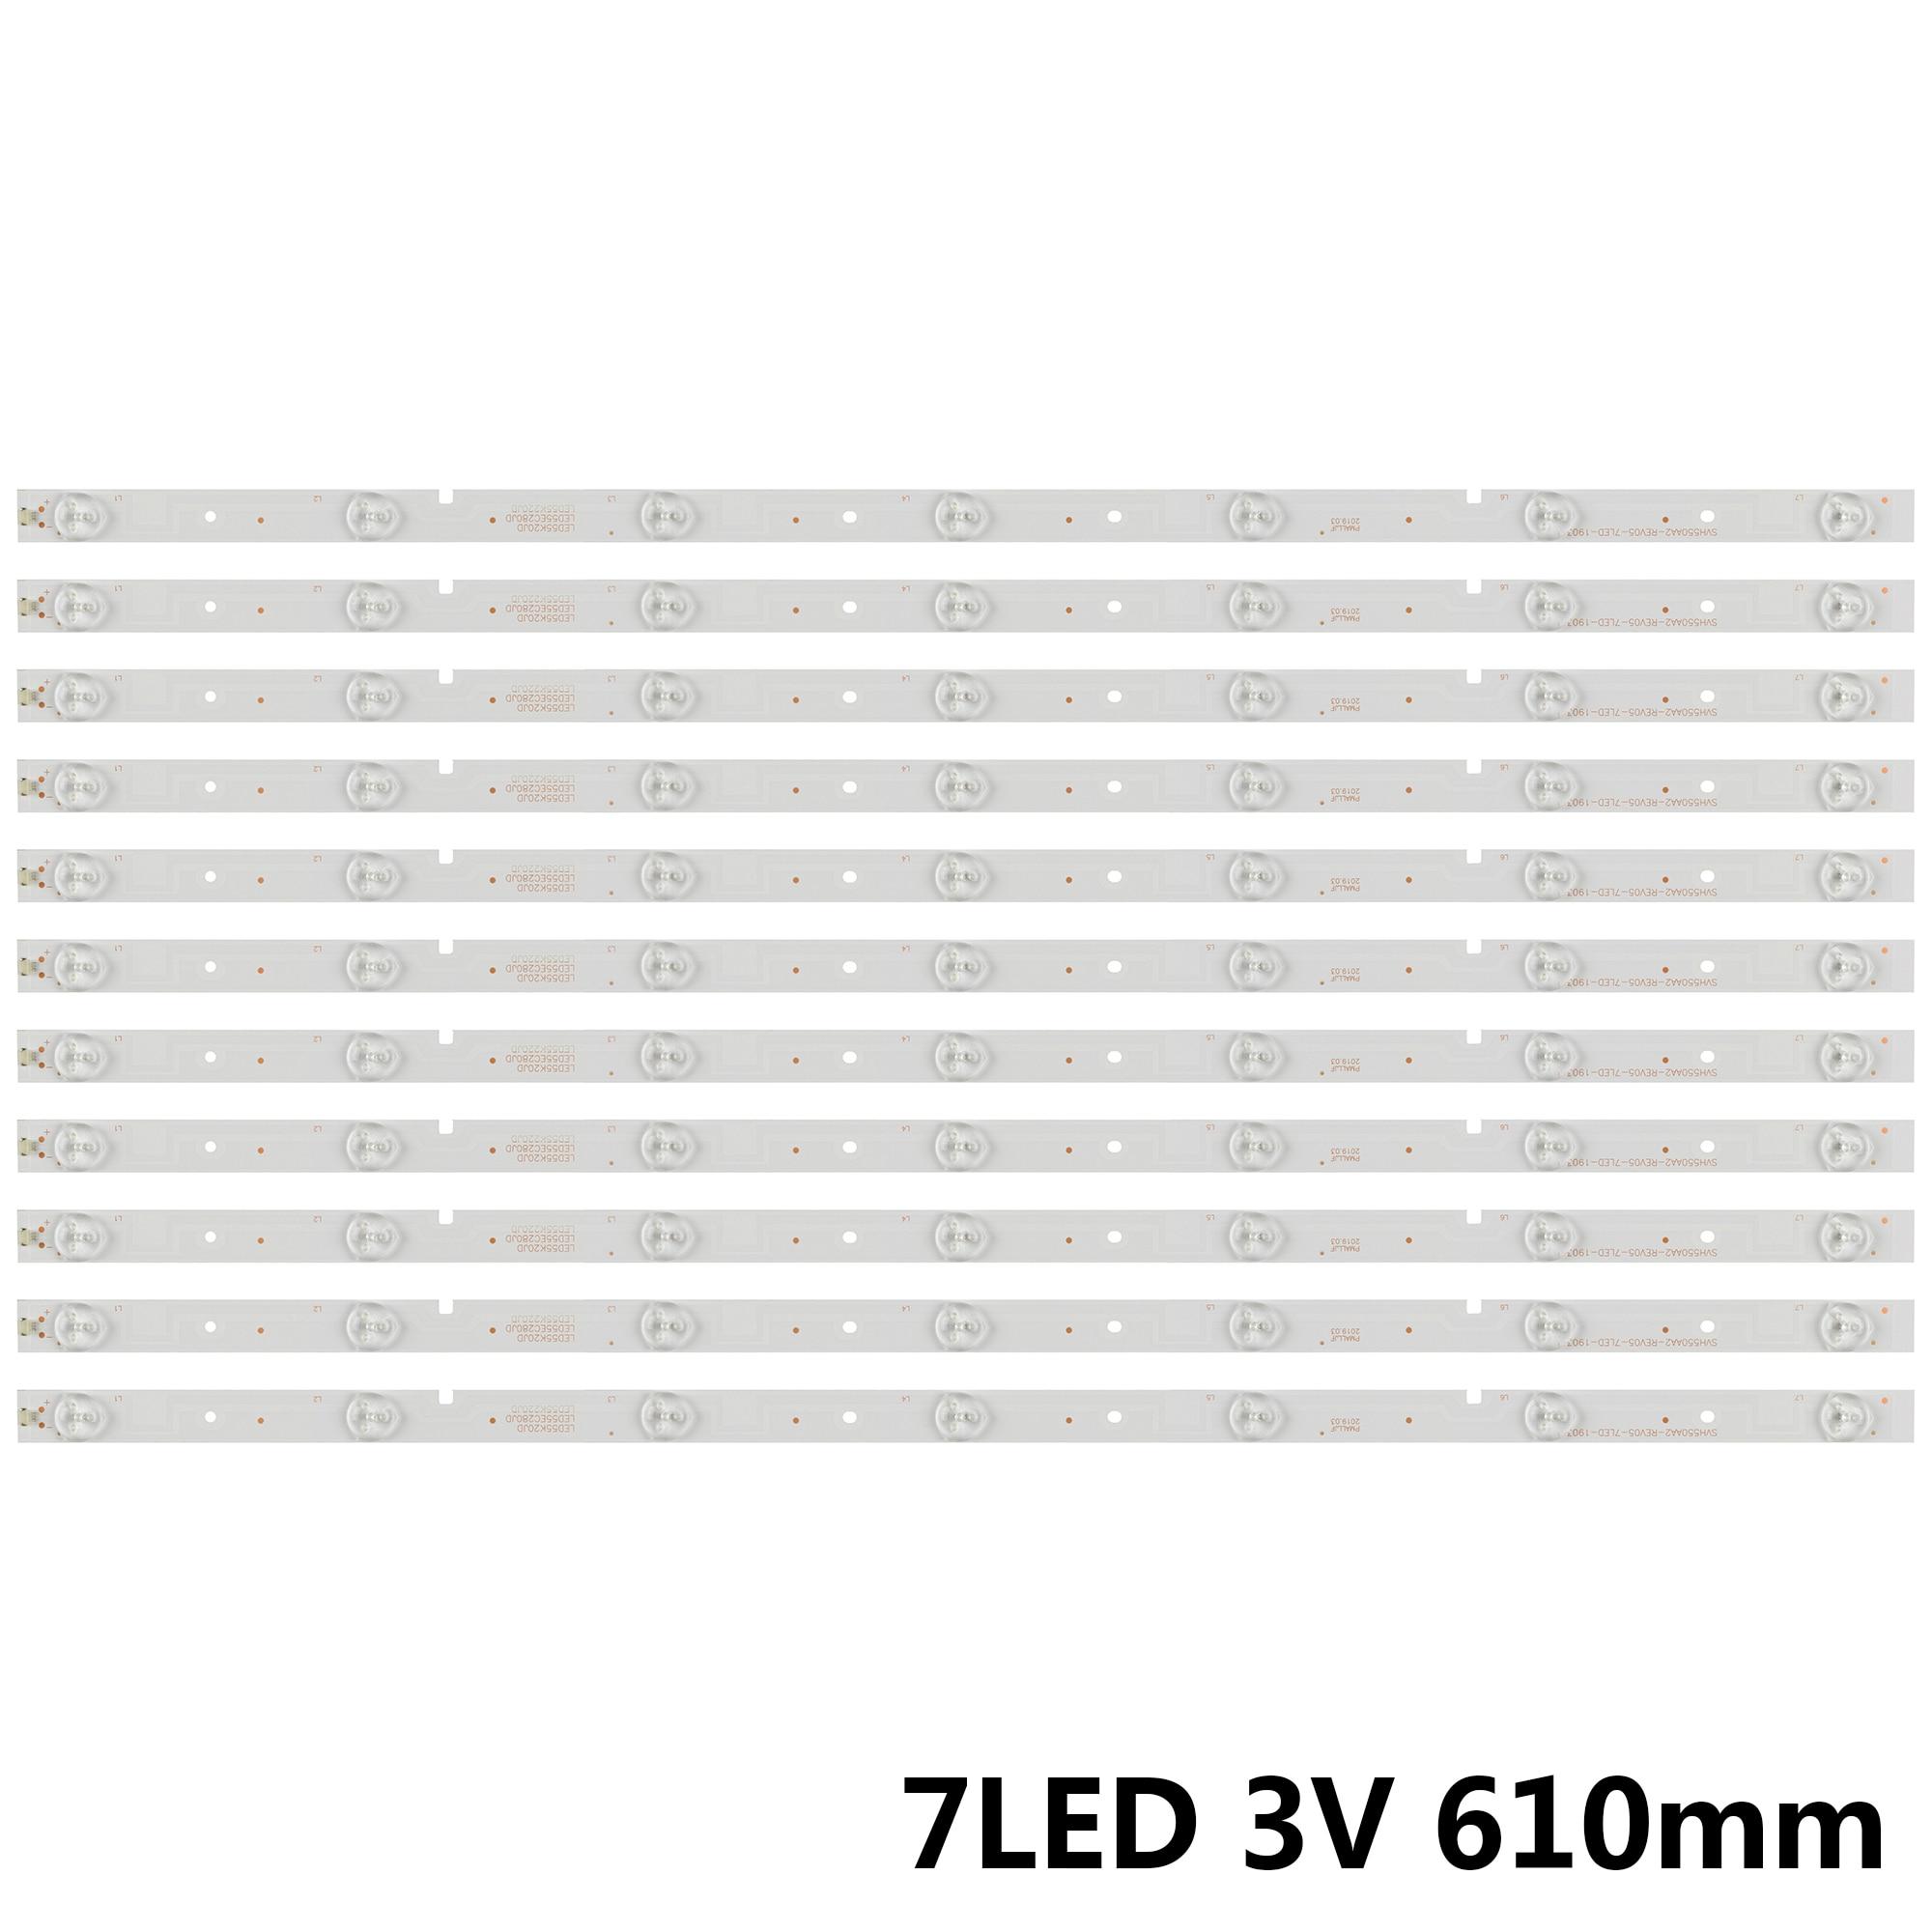 LED الخلفية شرائط ل شارة 55 التلفزيون NS-55D550NA15 55K20DG 55K23DG HD550DF B57 SVH550AA2 REV05 7LED 130719 55K23D9W SVH500AB1